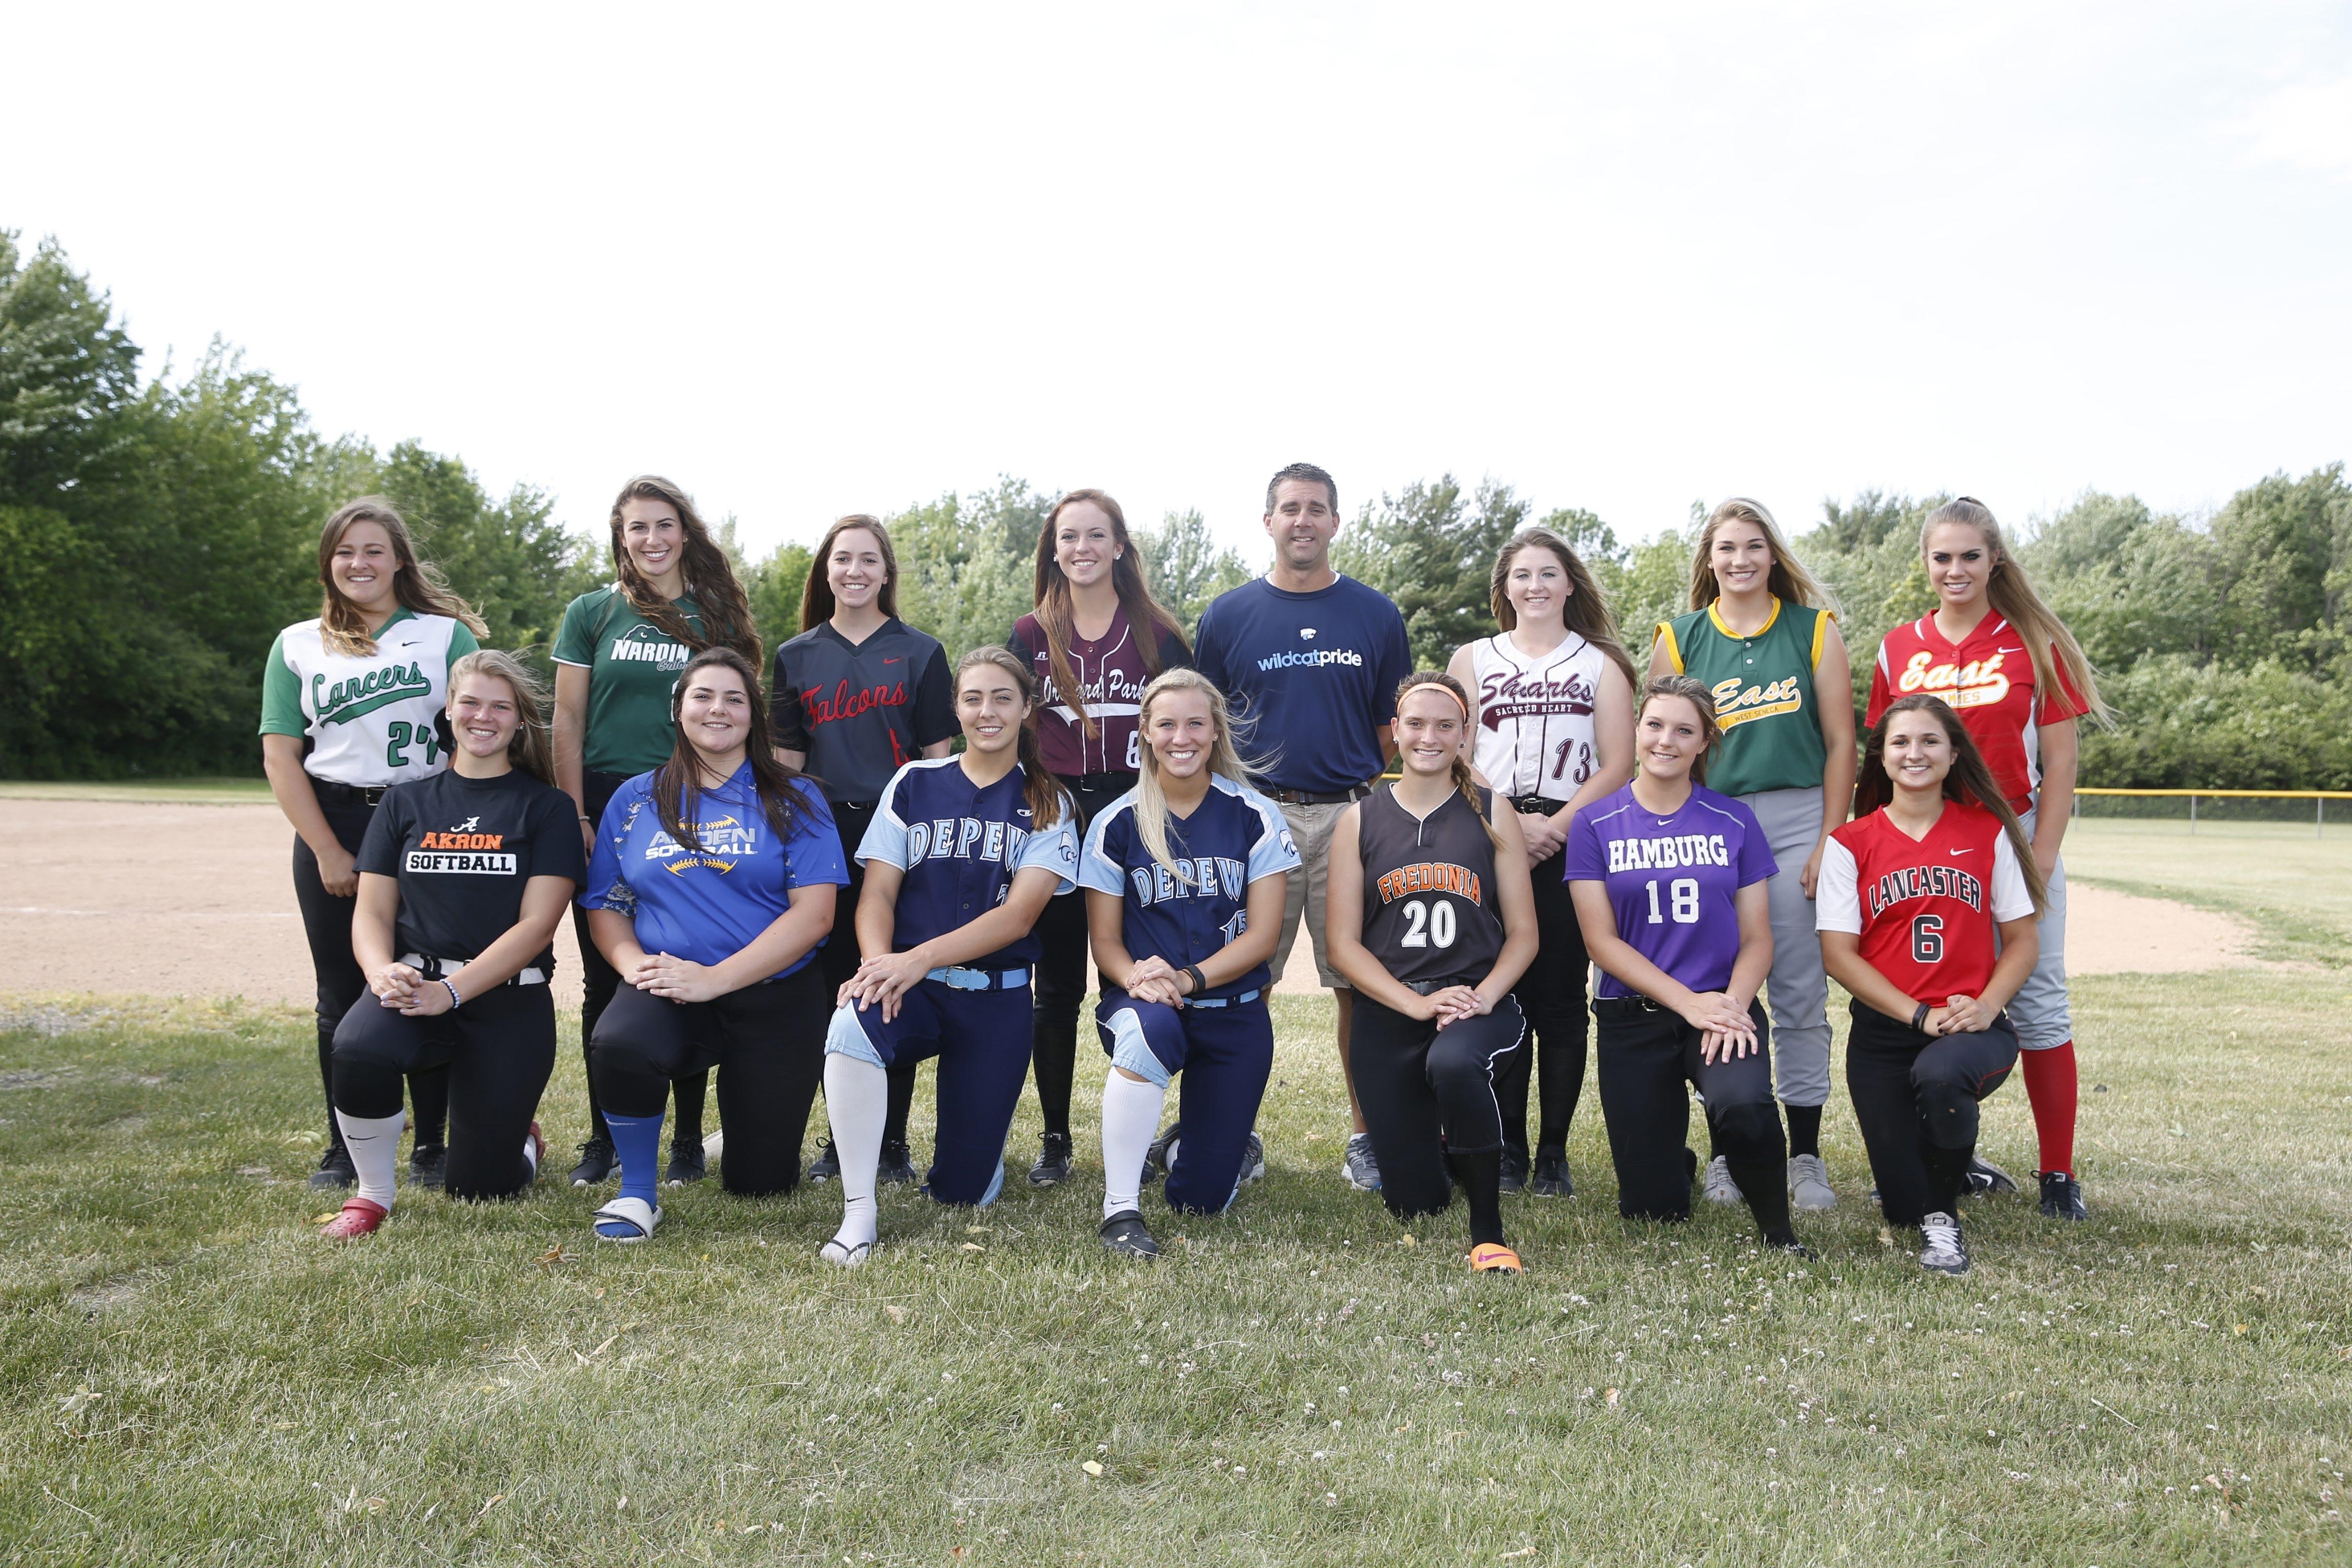 The All-Western New York Softball Team: Front row (L-R), Abby Stone, Akron; Laura Kratzke, Alden; Karsen Cotton, Depew; Abby Nicometi, Depew; Hannah Cybart, Fredonia; Heather Haberman, Hamburg; Kara Paradowski, Lancaster; Back row (L-R), Jenna Rhue, Lew-Port; Rachael Perelstein, Nardin; Madison Klidonas, Niagara Wheatfield; Madison Stewart, Orchard Park; Dan Seelig, Depew, Coach of the Year; Shannon Gilbert, Sacred Heart; Anilese Kelly, West Seneca East; Christy Mack, Williamsville East.